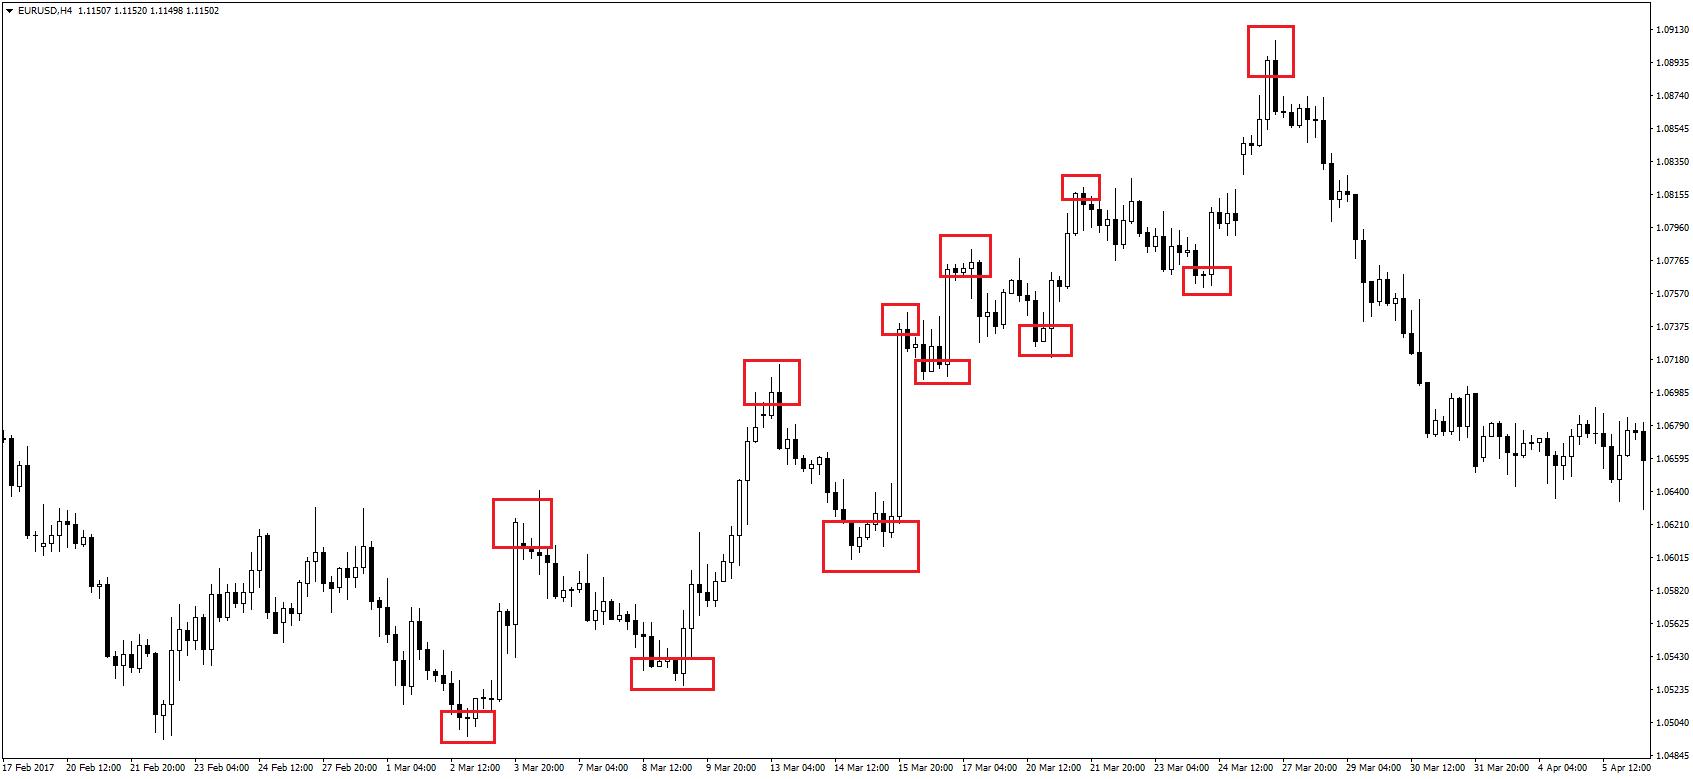 cryptocurrency day trading fibonacci pullback strategy